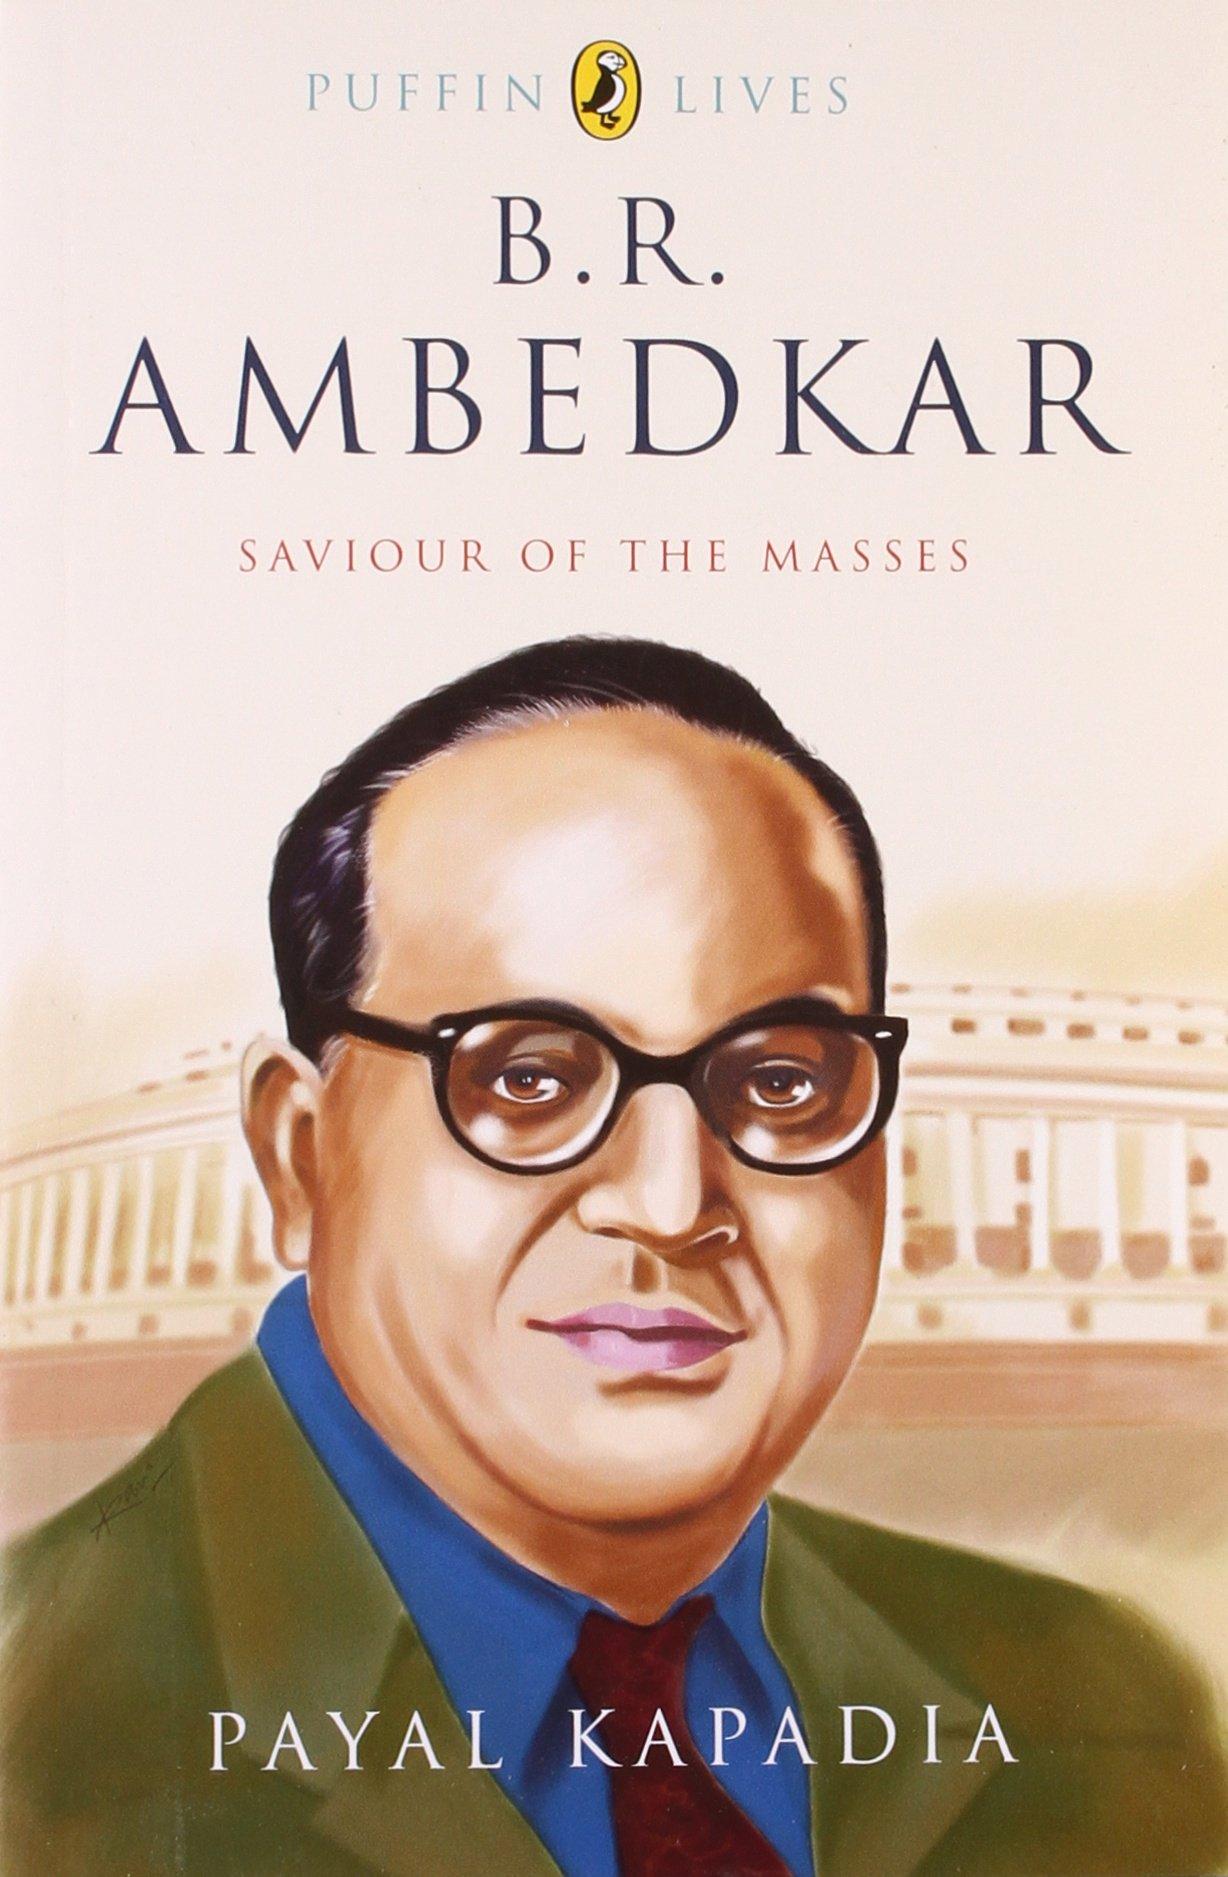 Download Puffin Lives: B.R. Ambedkar, Saviour of the Masses pdf epub